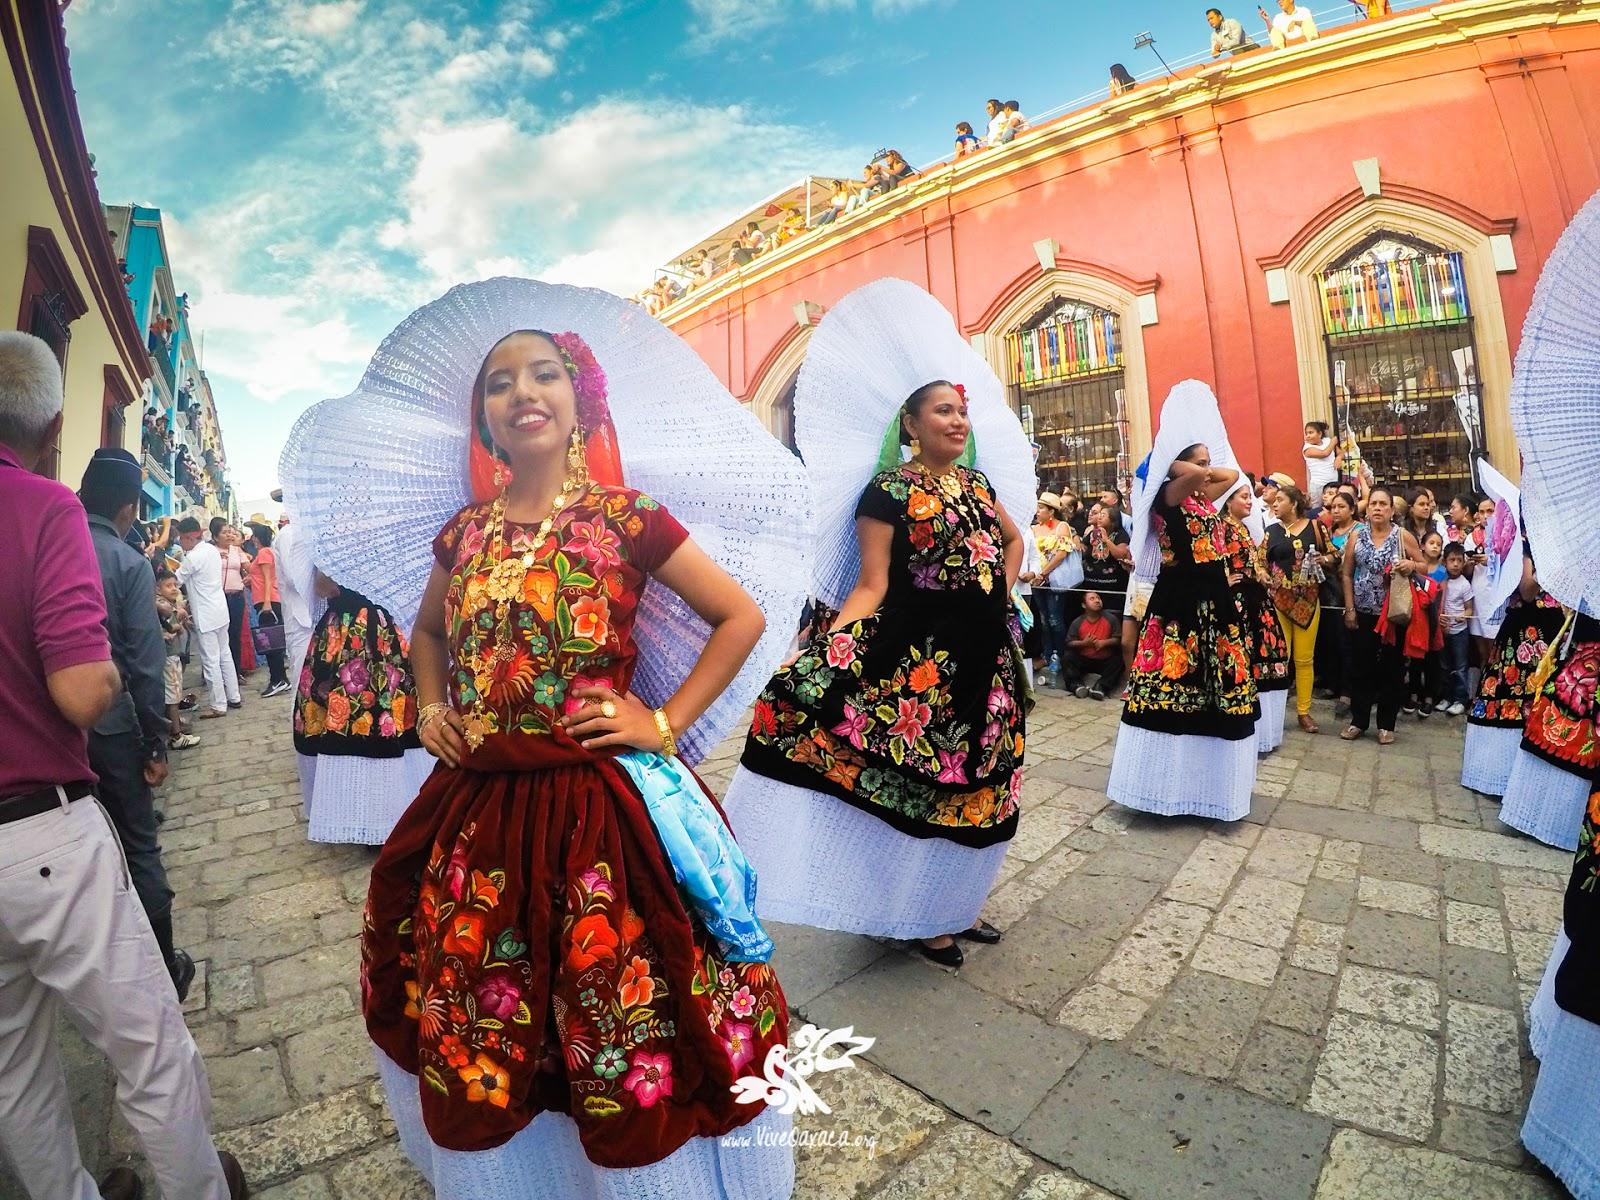 GUELAGUETZA 2018: Primer Desfile de Delegaciones (Galería) - Vive Oaxaca -  Pagina oficial Vive Oaxaca - Pagina oficial